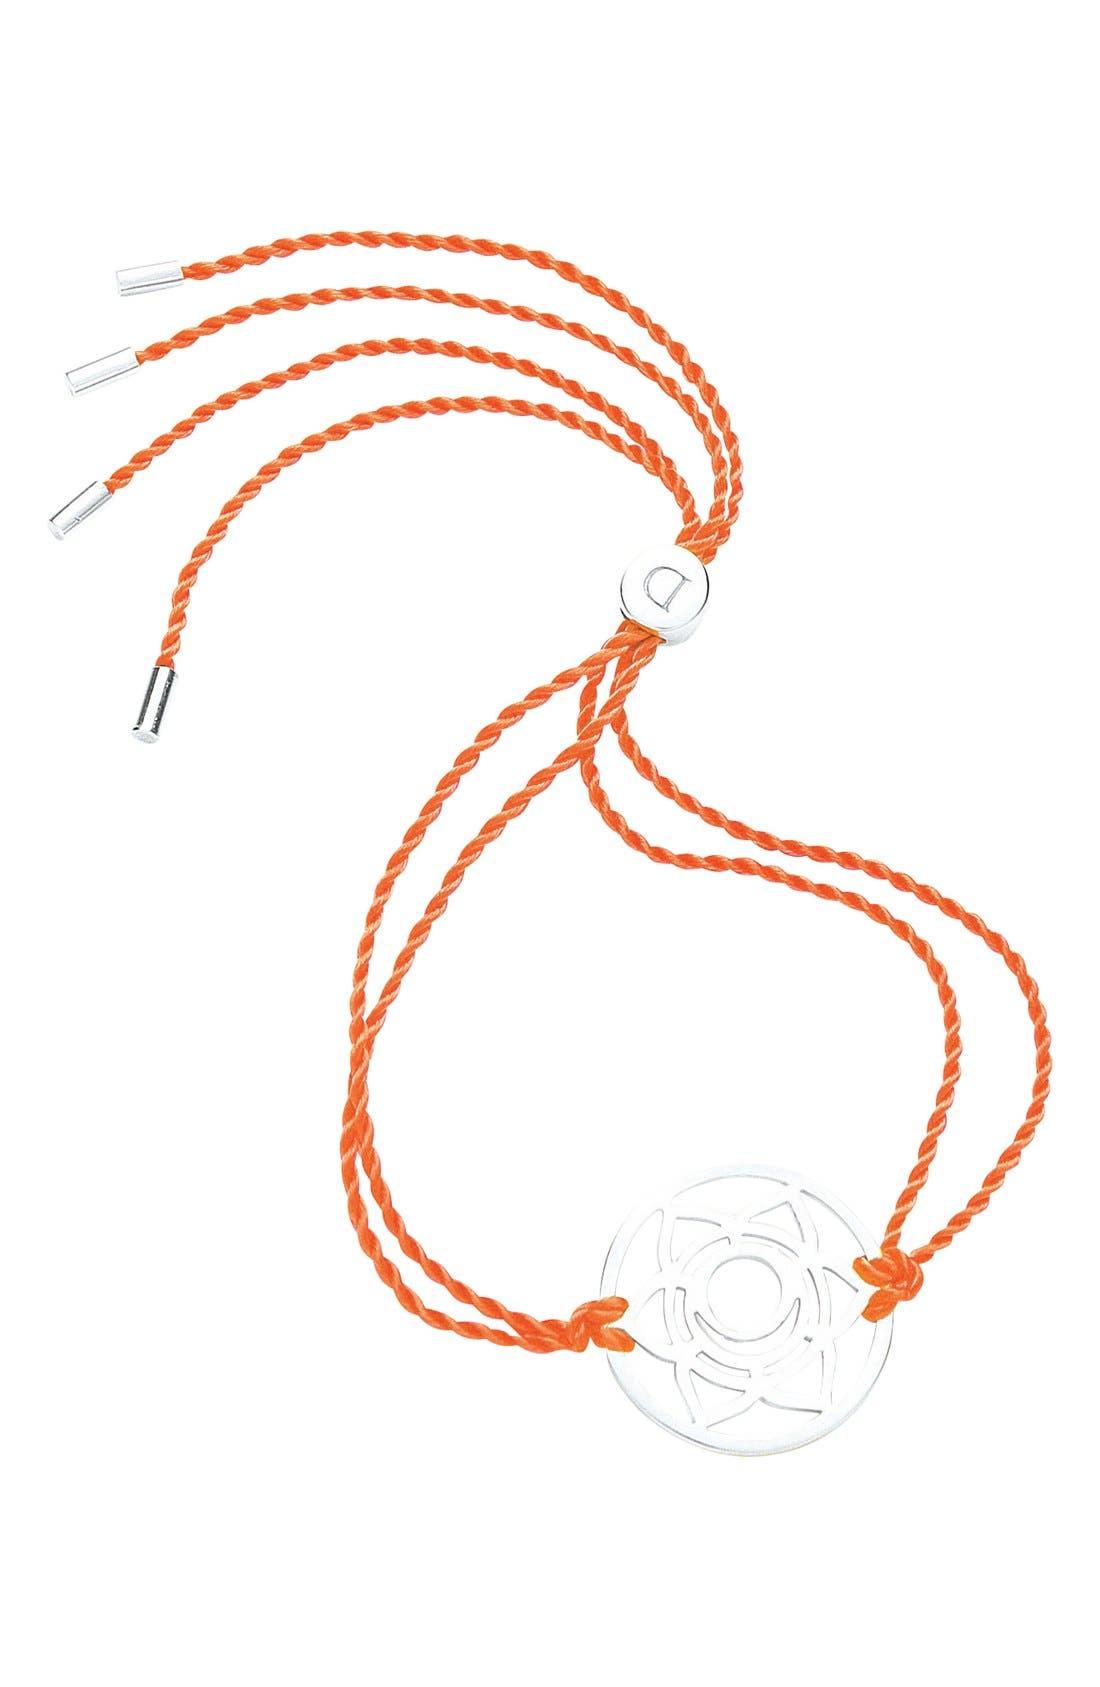 'Sacral Chakra' Cord Bracelet,                             Main thumbnail 1, color,                             925 Sterling Silver/Orange